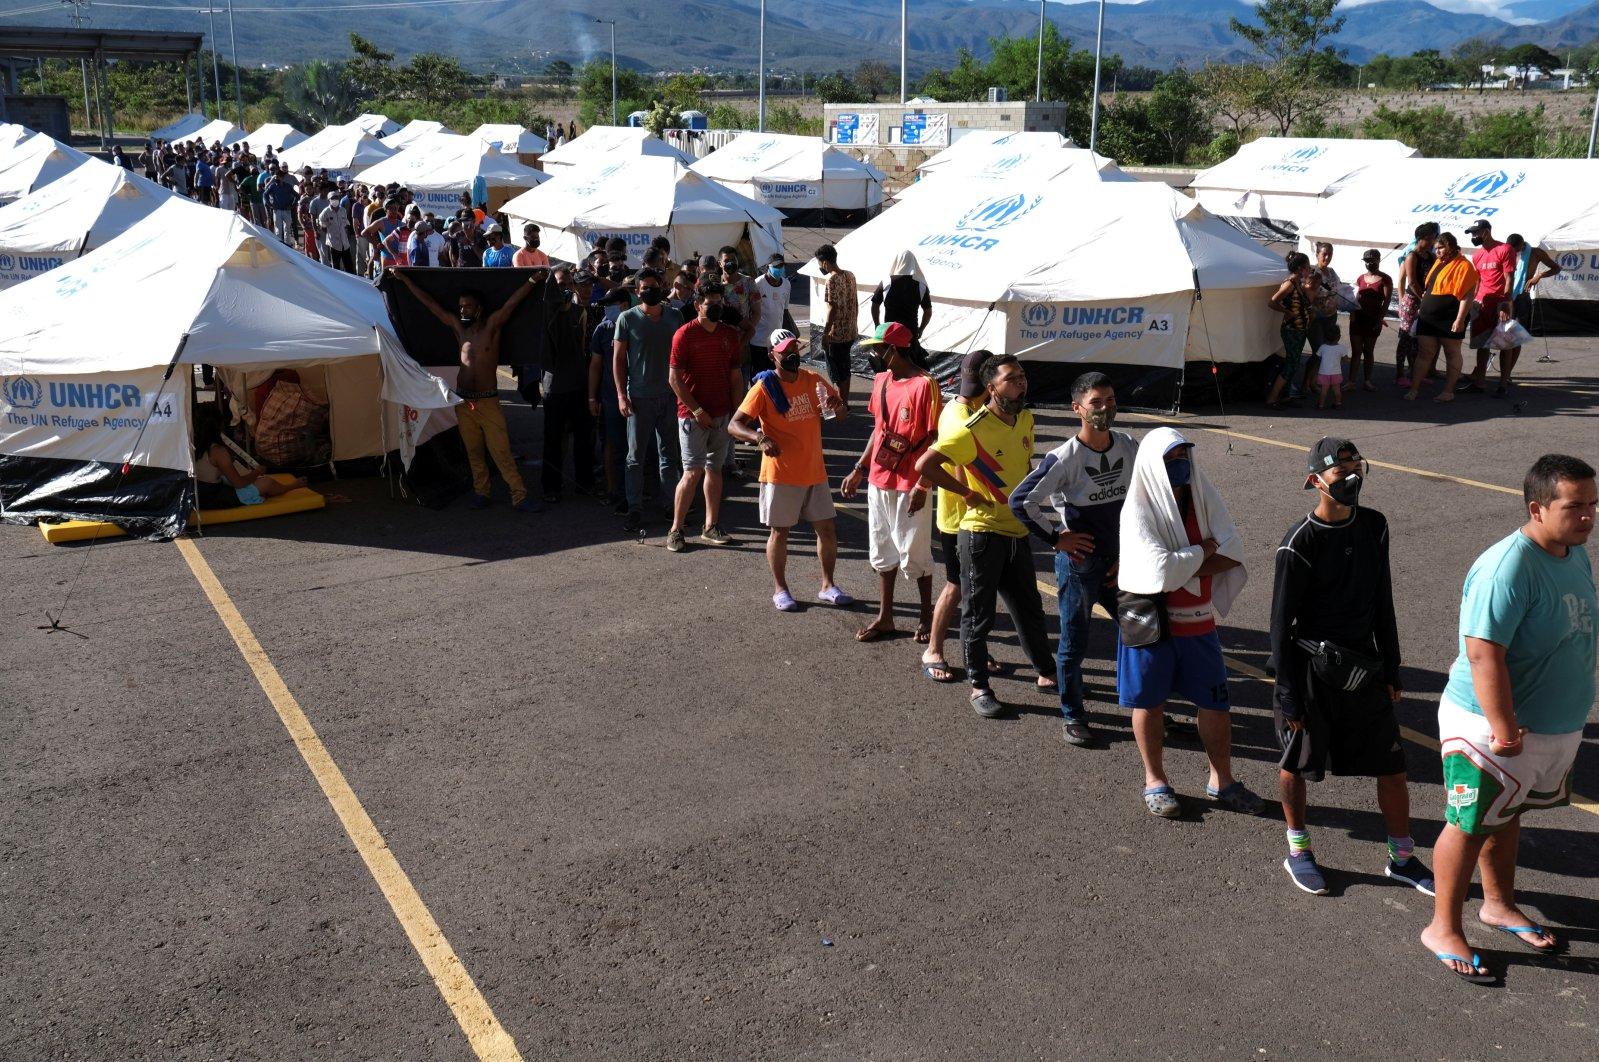 Venezuelan migrants stand in line at a health care center at the Venezuelan border, Cucuta, Colombia, June 16, 2020. (Reuters Photo)